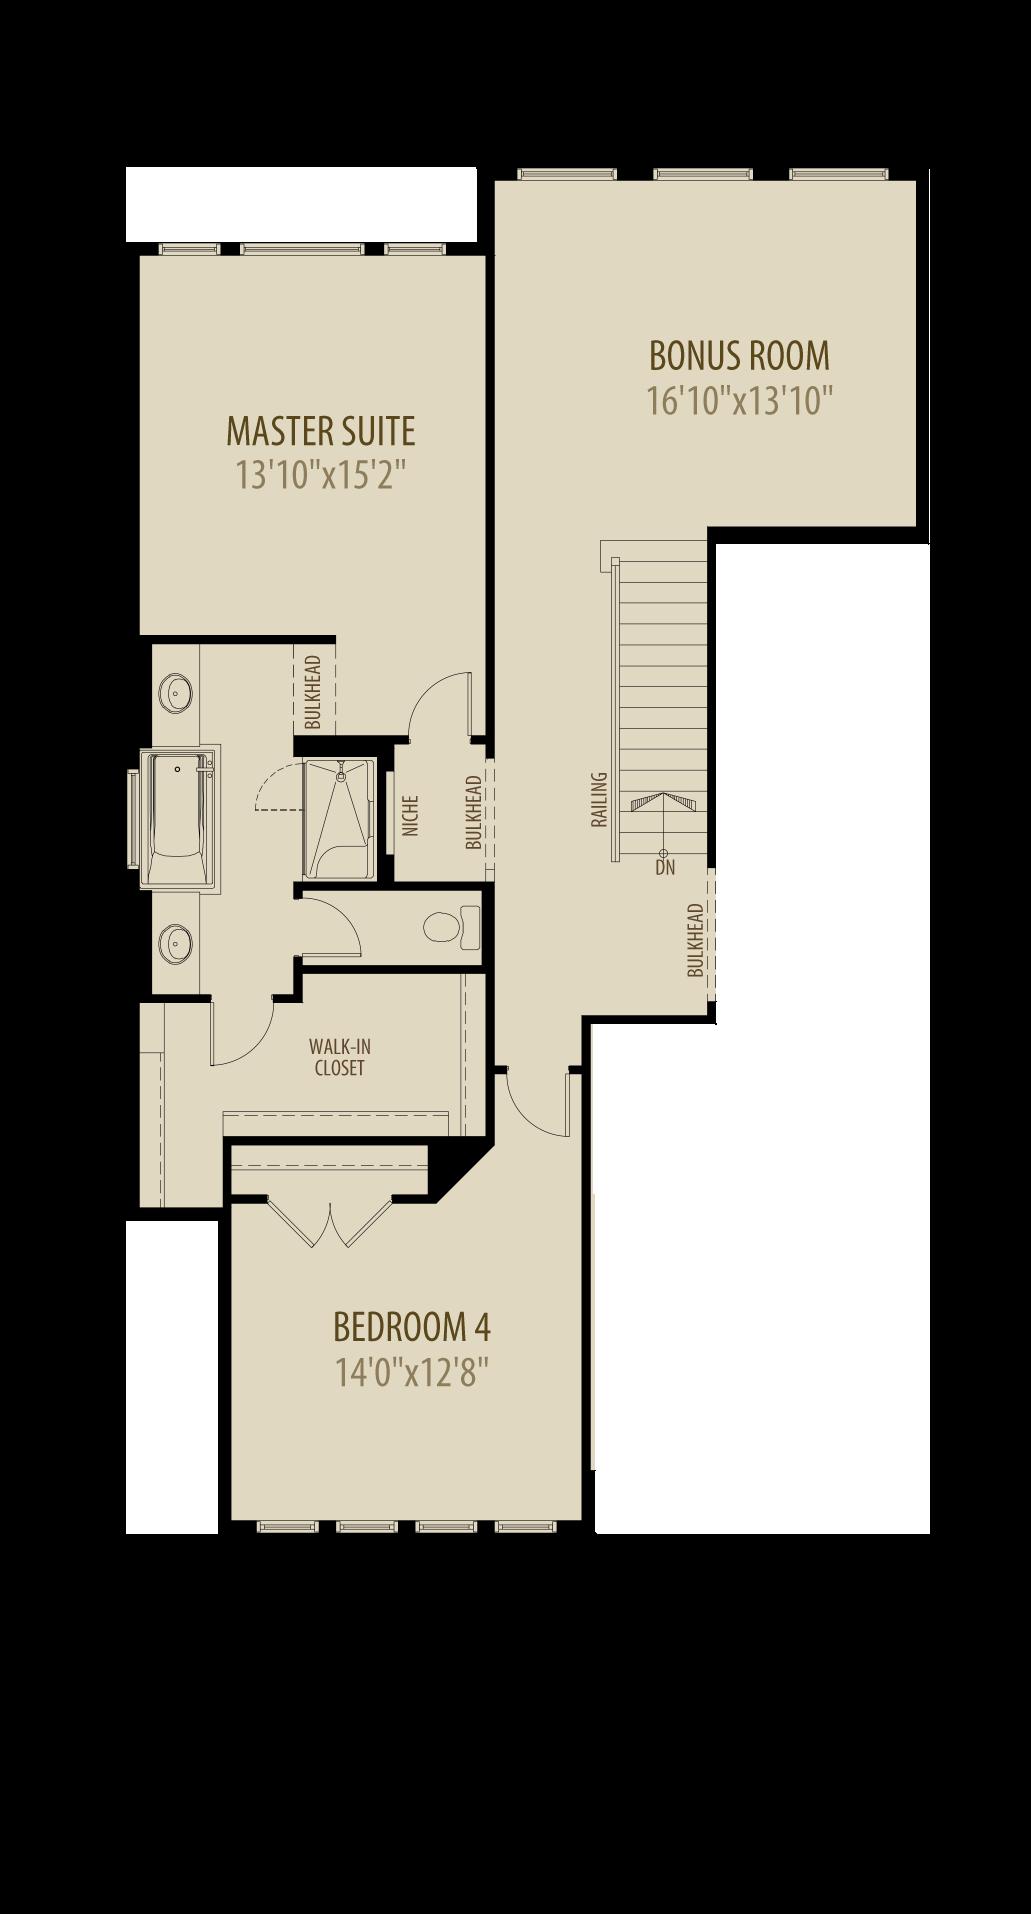 4th bedroom bonus room adds 290sq ft